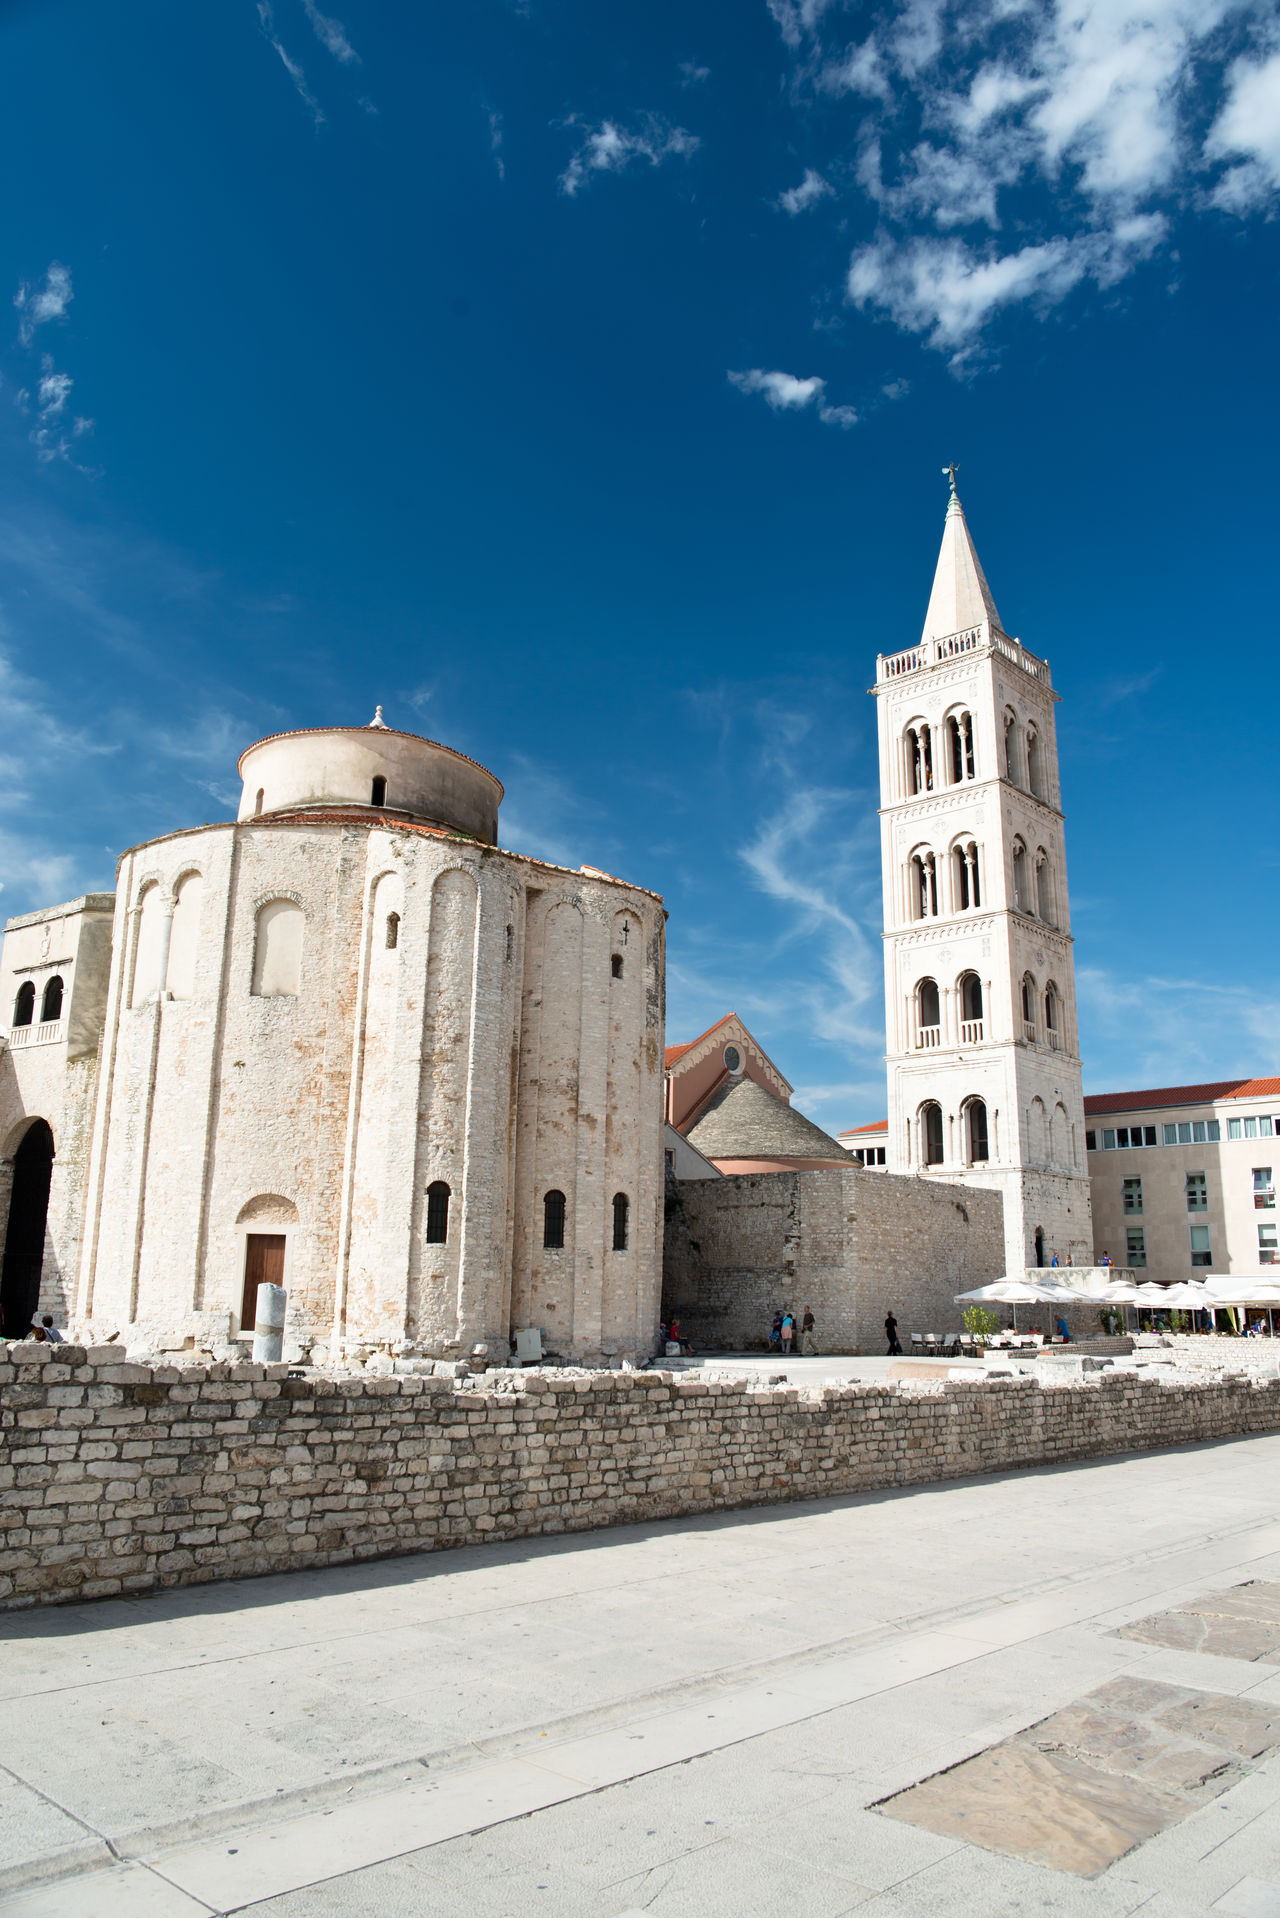 Architecture Building Exterior Built Structure Croatia Croatia ♡ Croatia ❤ History Outdoors Place Of Worship Tower Travel Destinations Zadar,Croatia